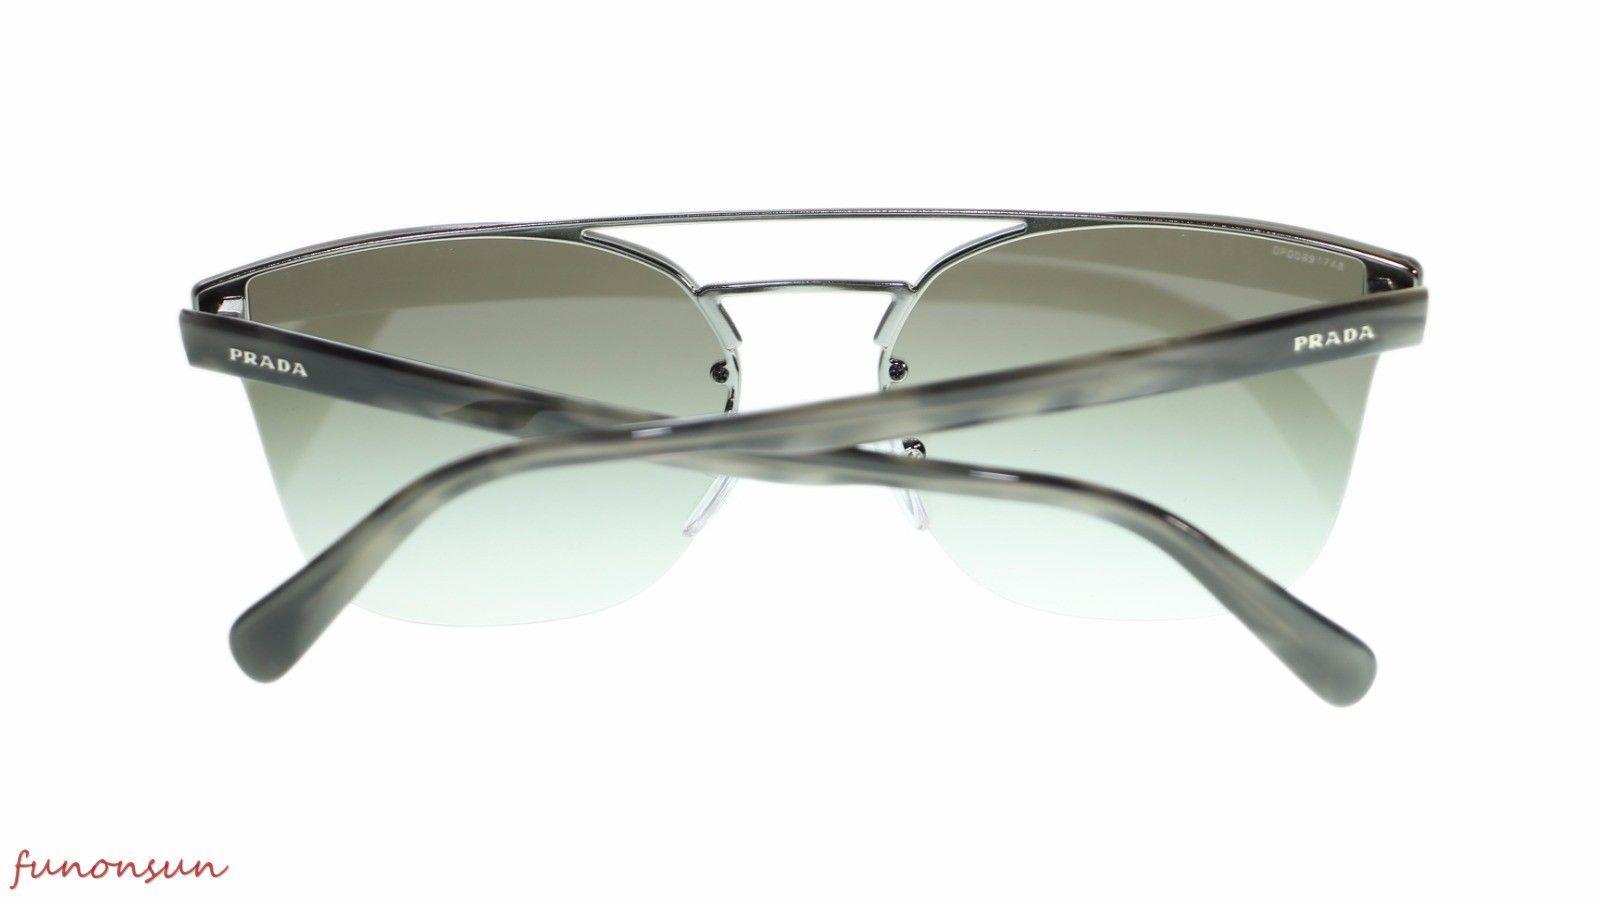 Prada Men's Sunglasses PR67TS 5AV0A7 Gunmetal Grey Gradient Lens 63mm